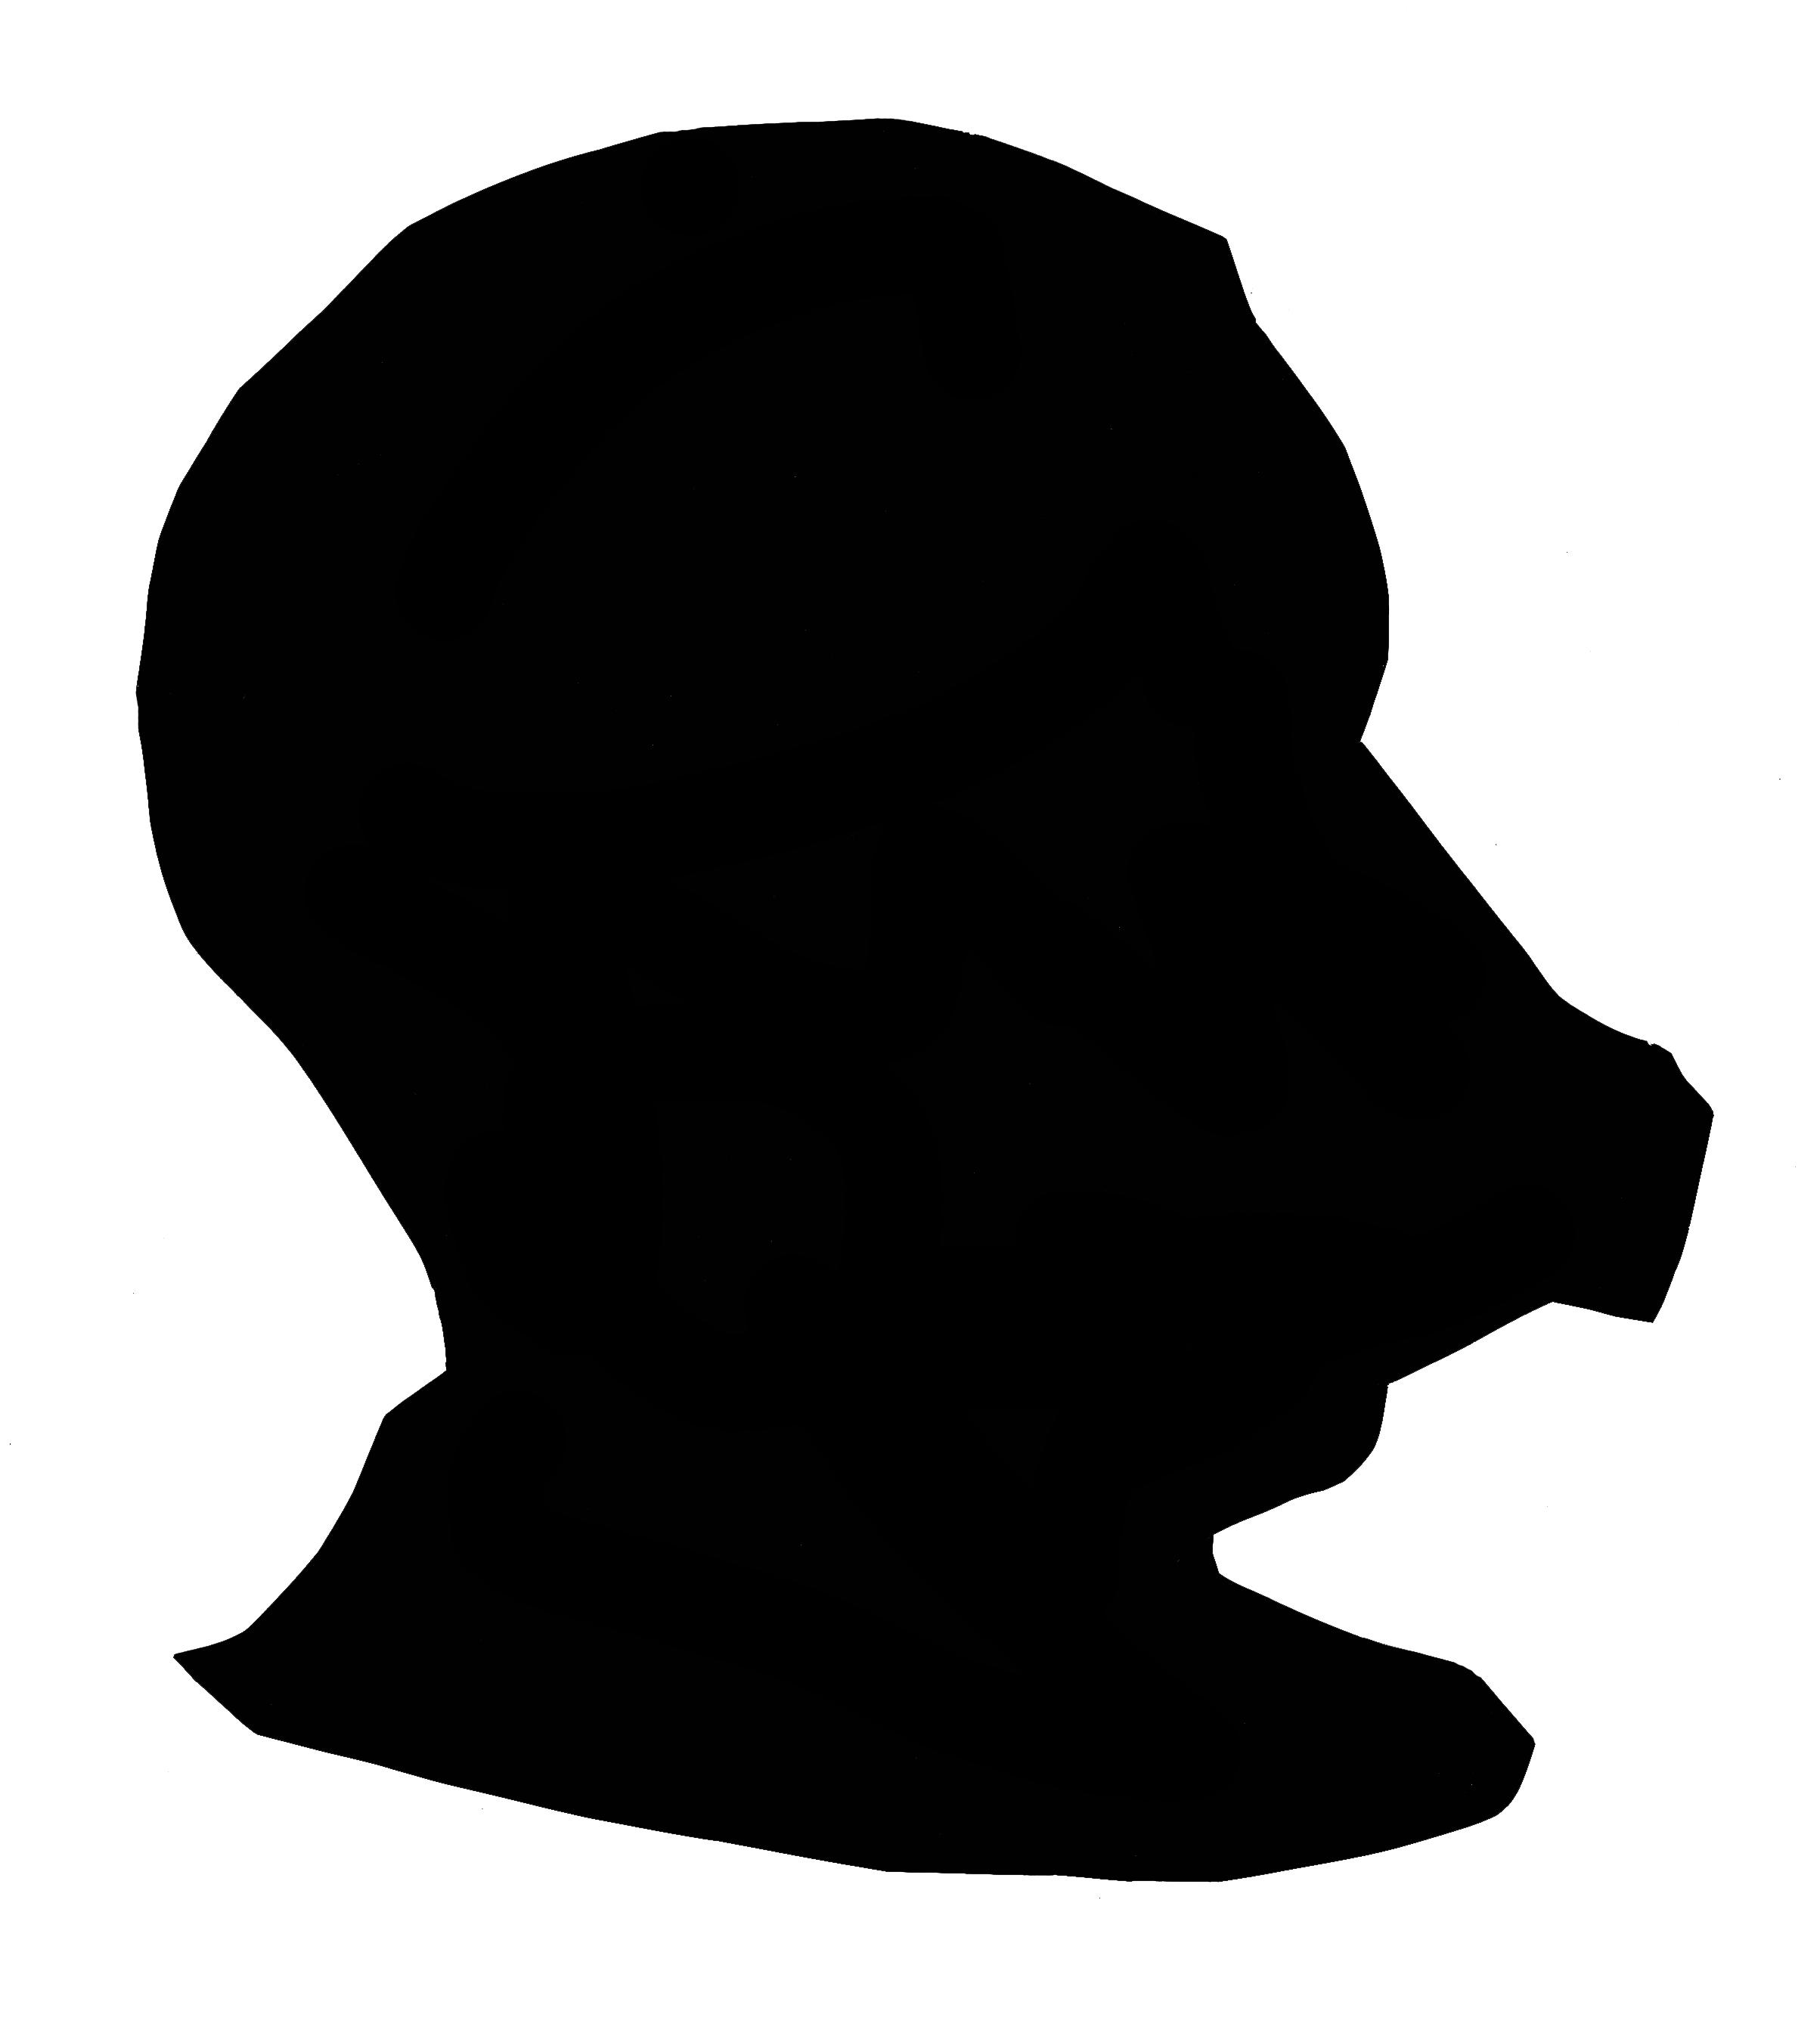 gas mask silhouette.jpg